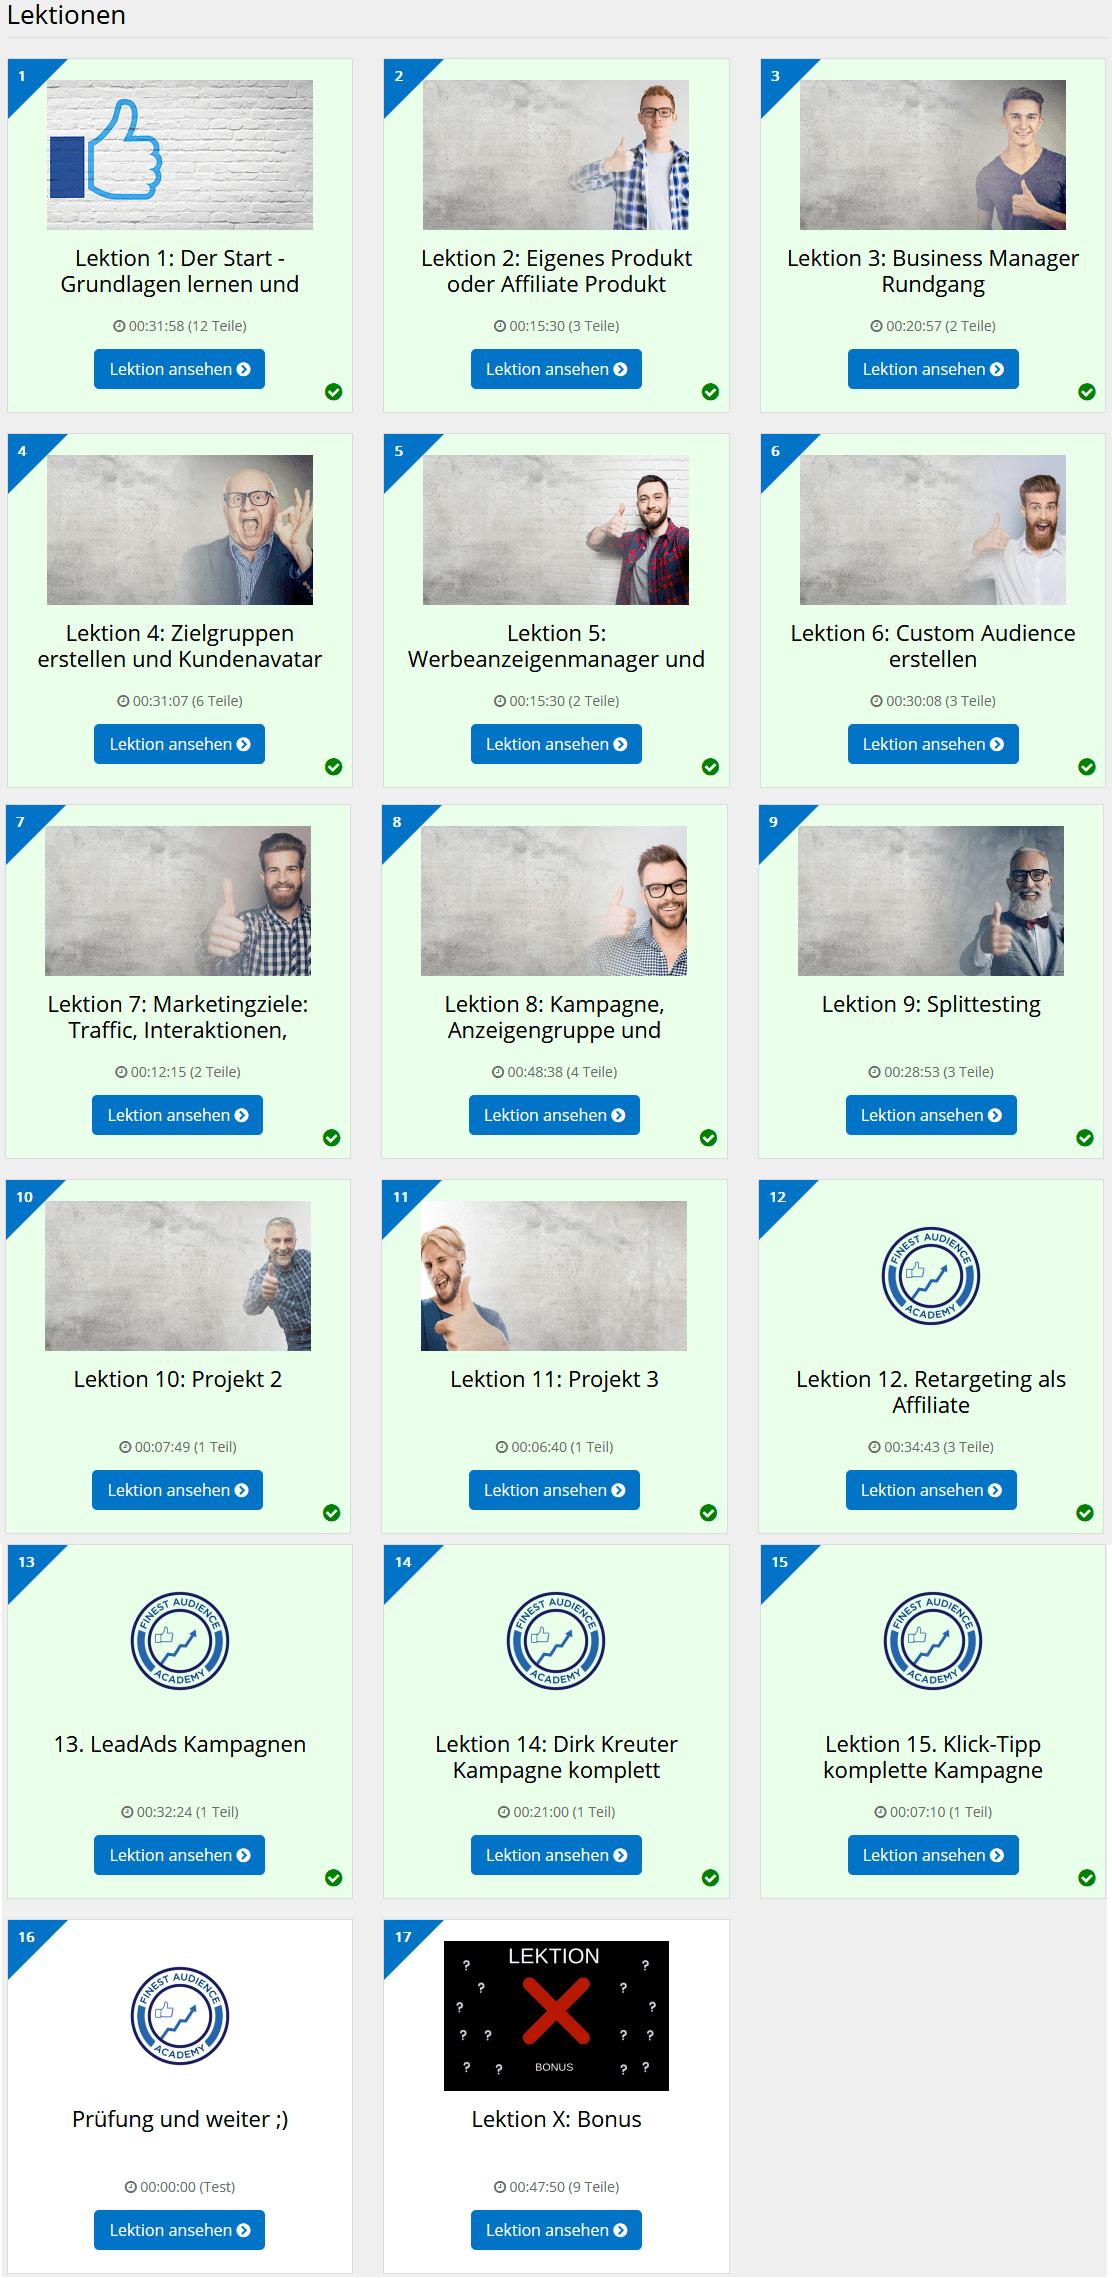 finest academy online kurs uebersicht